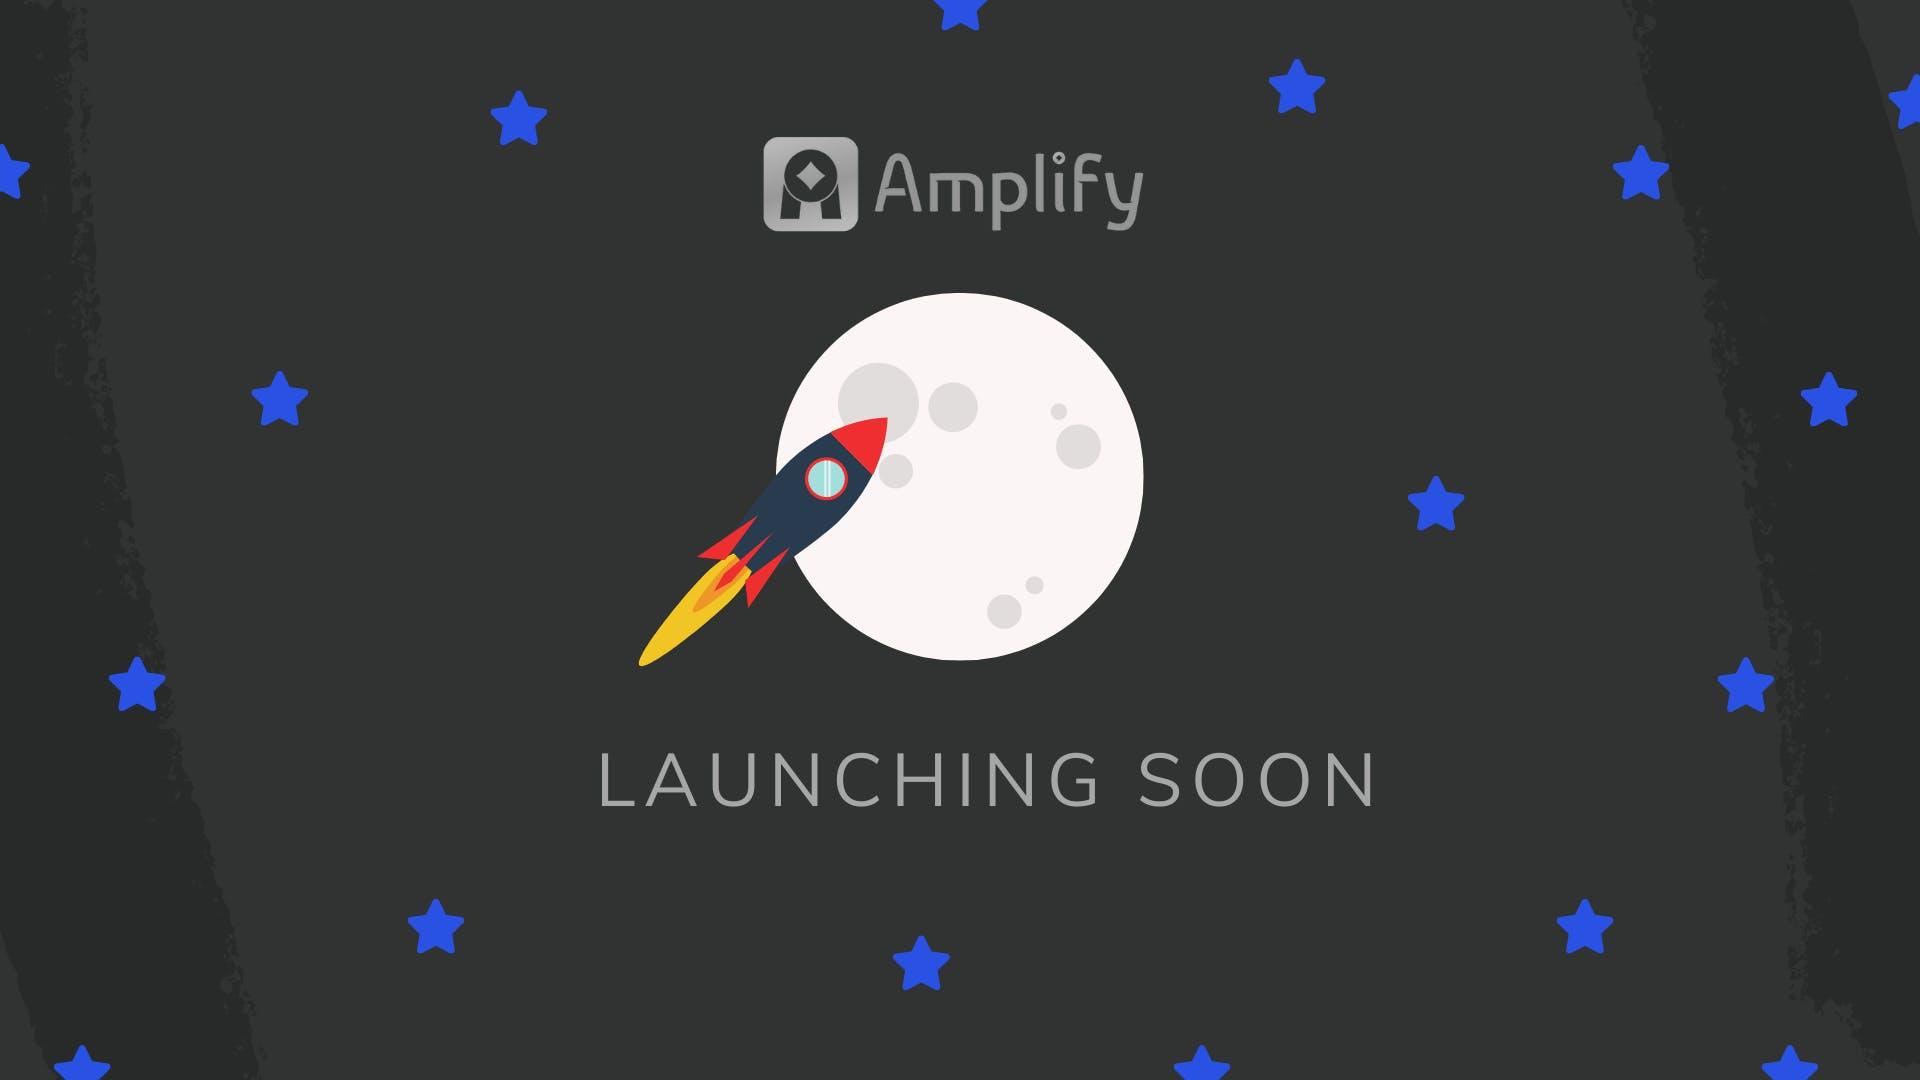 Amplify Defi lending platform launching soon